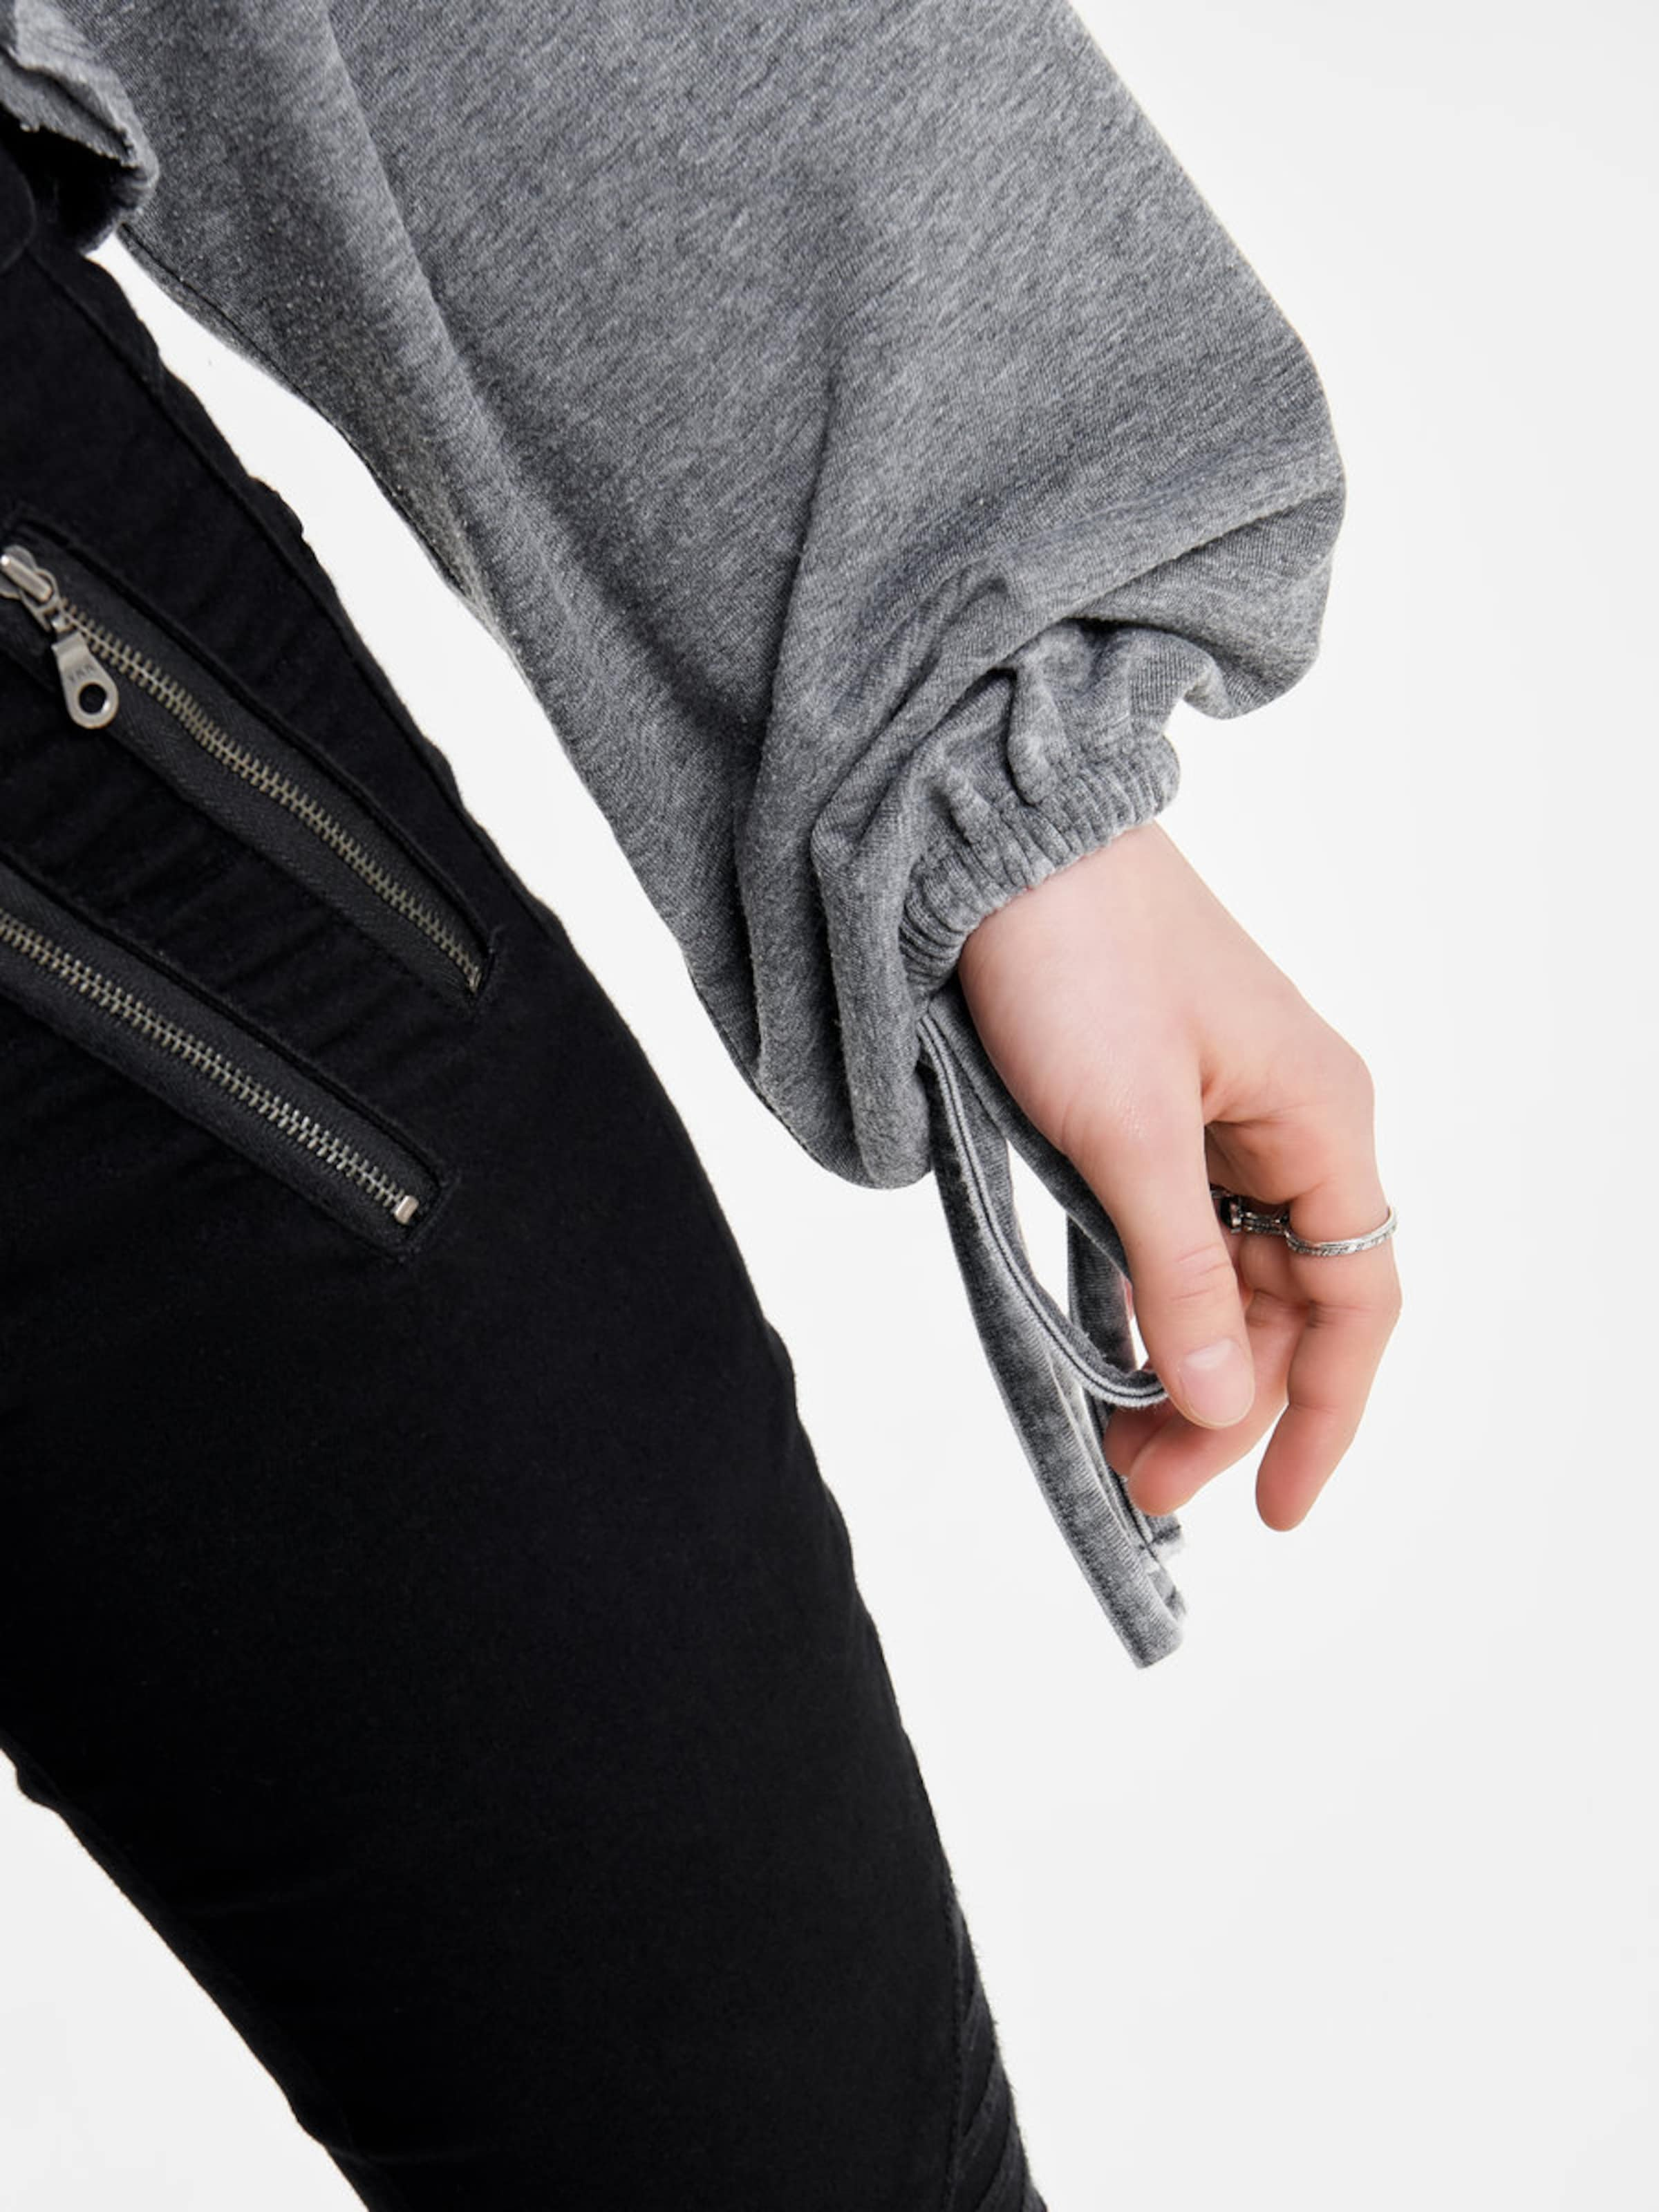 ONLY Kurz geschnittenes Sweatshirt Mode Online Bester Verkauf Günstiger Preis Ag3IOFvE3